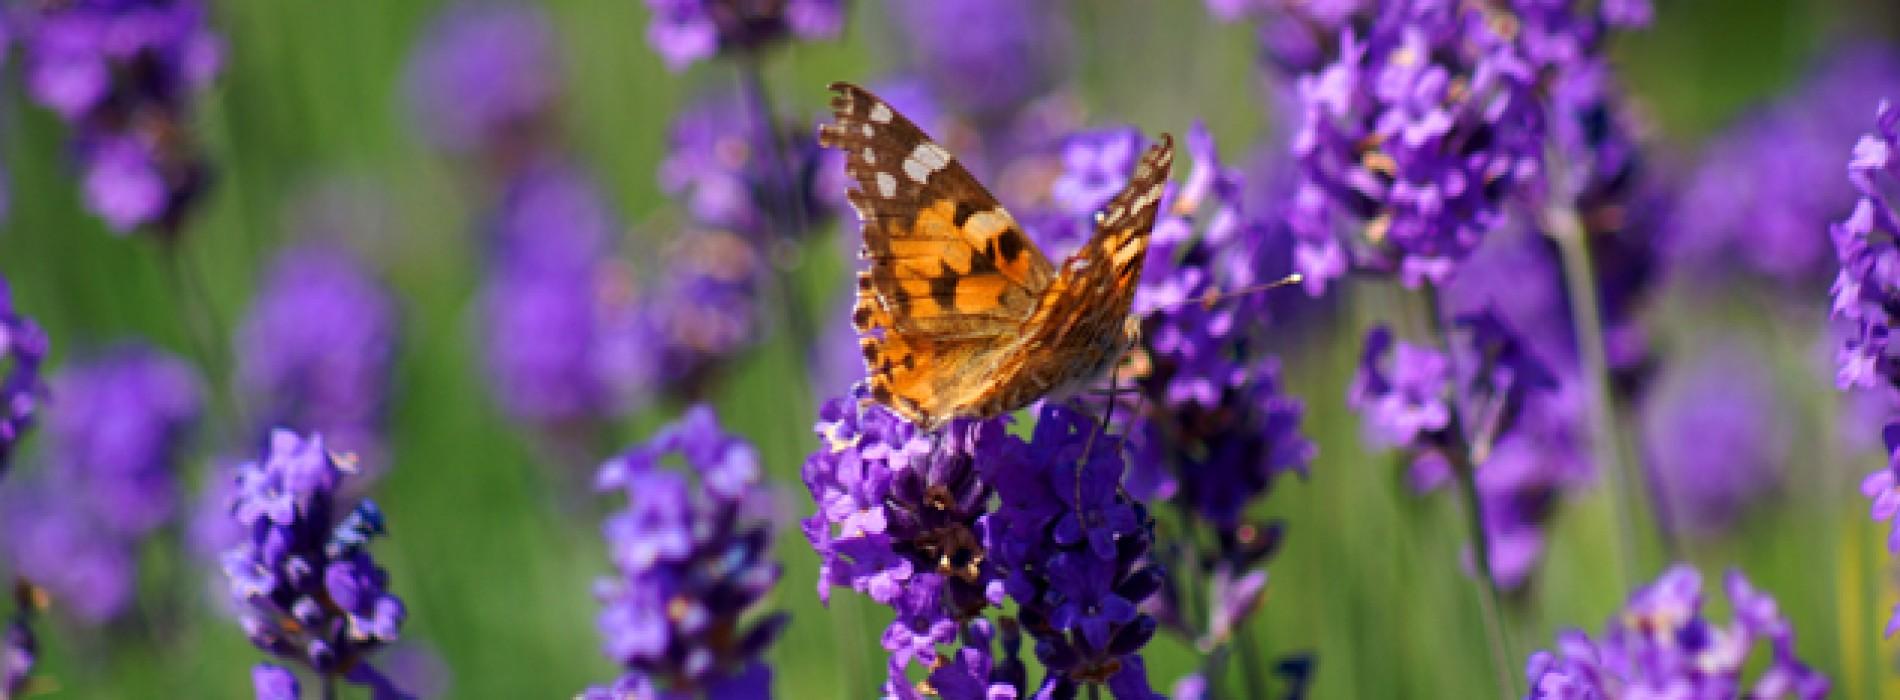 Lavendel beter dan antidepressiva